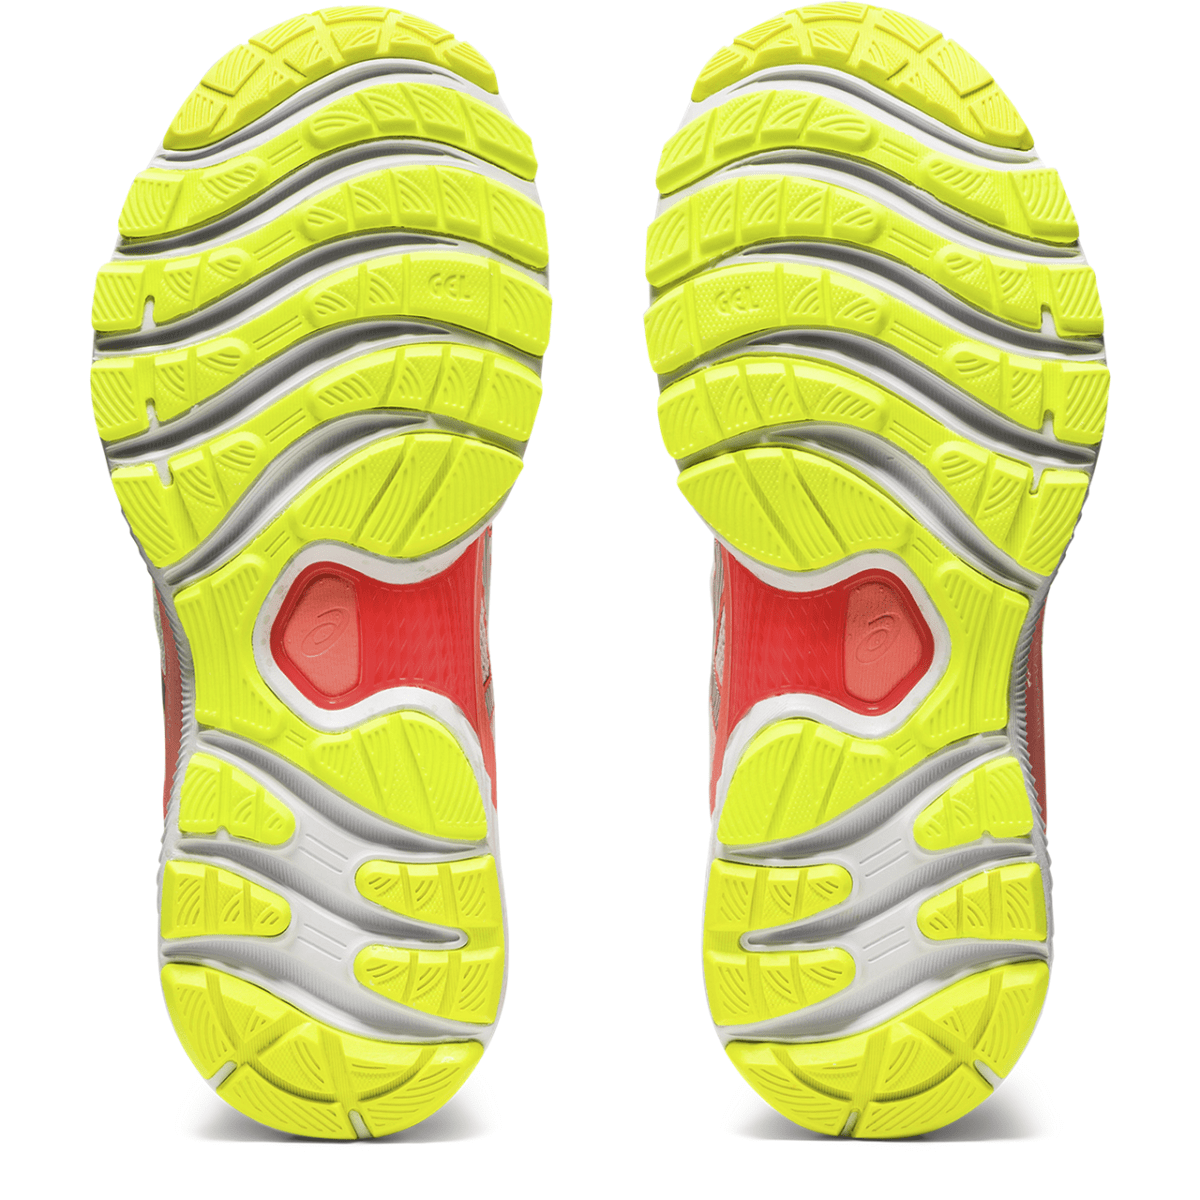 Naiste jooksujalats Asics Gel-Nimbus 22 Lite-Show W 2020 (White/Sun Coral)